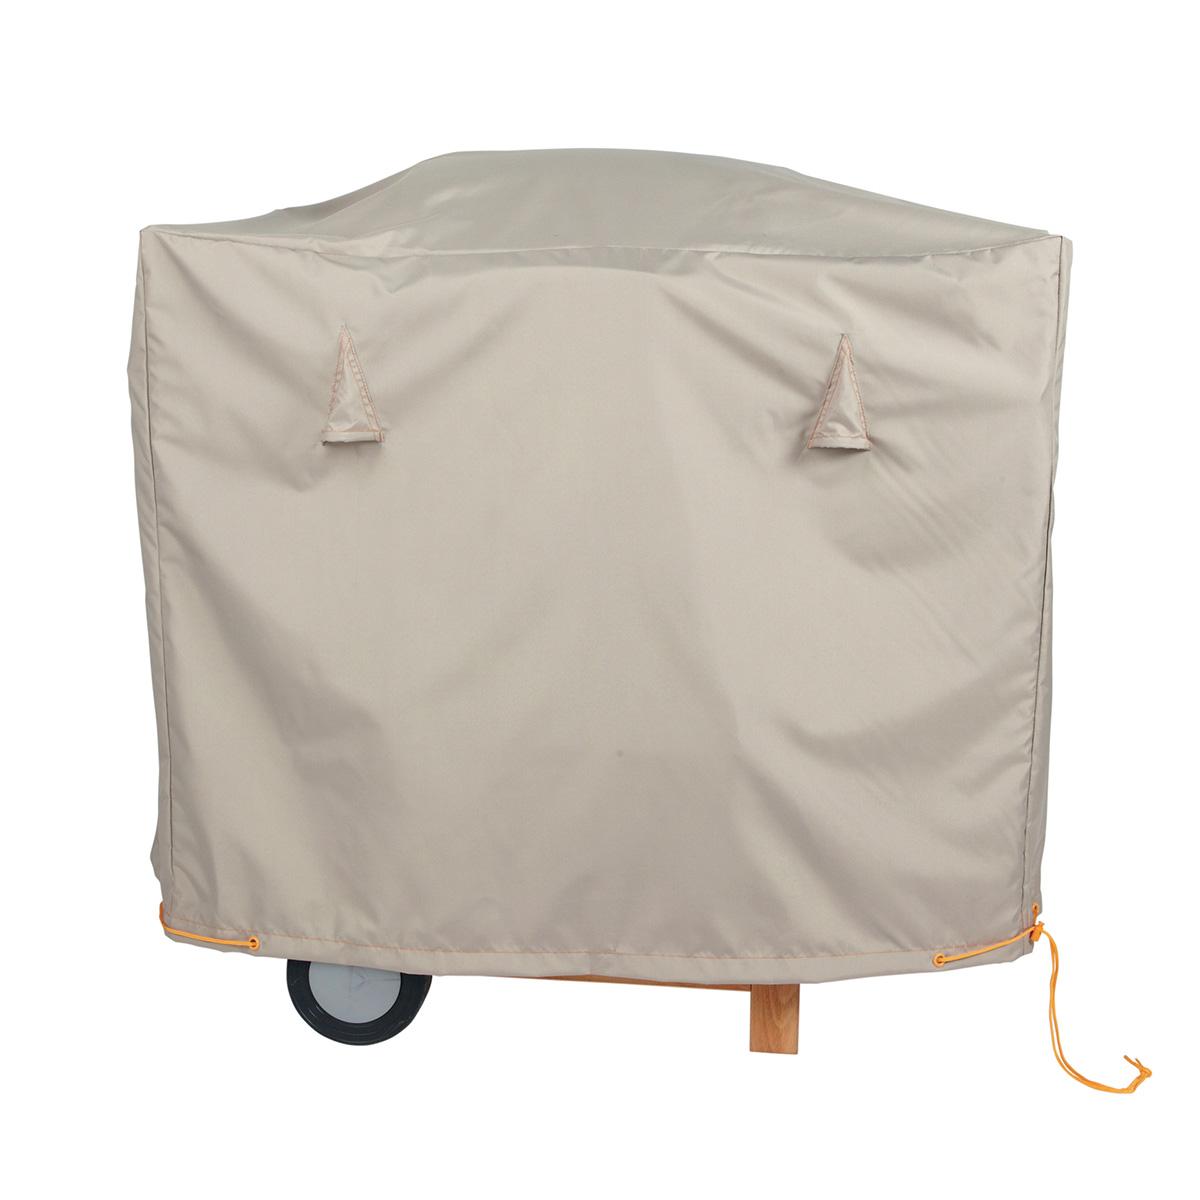 Housse de protection barbecue taille XXL - Innov' Axe